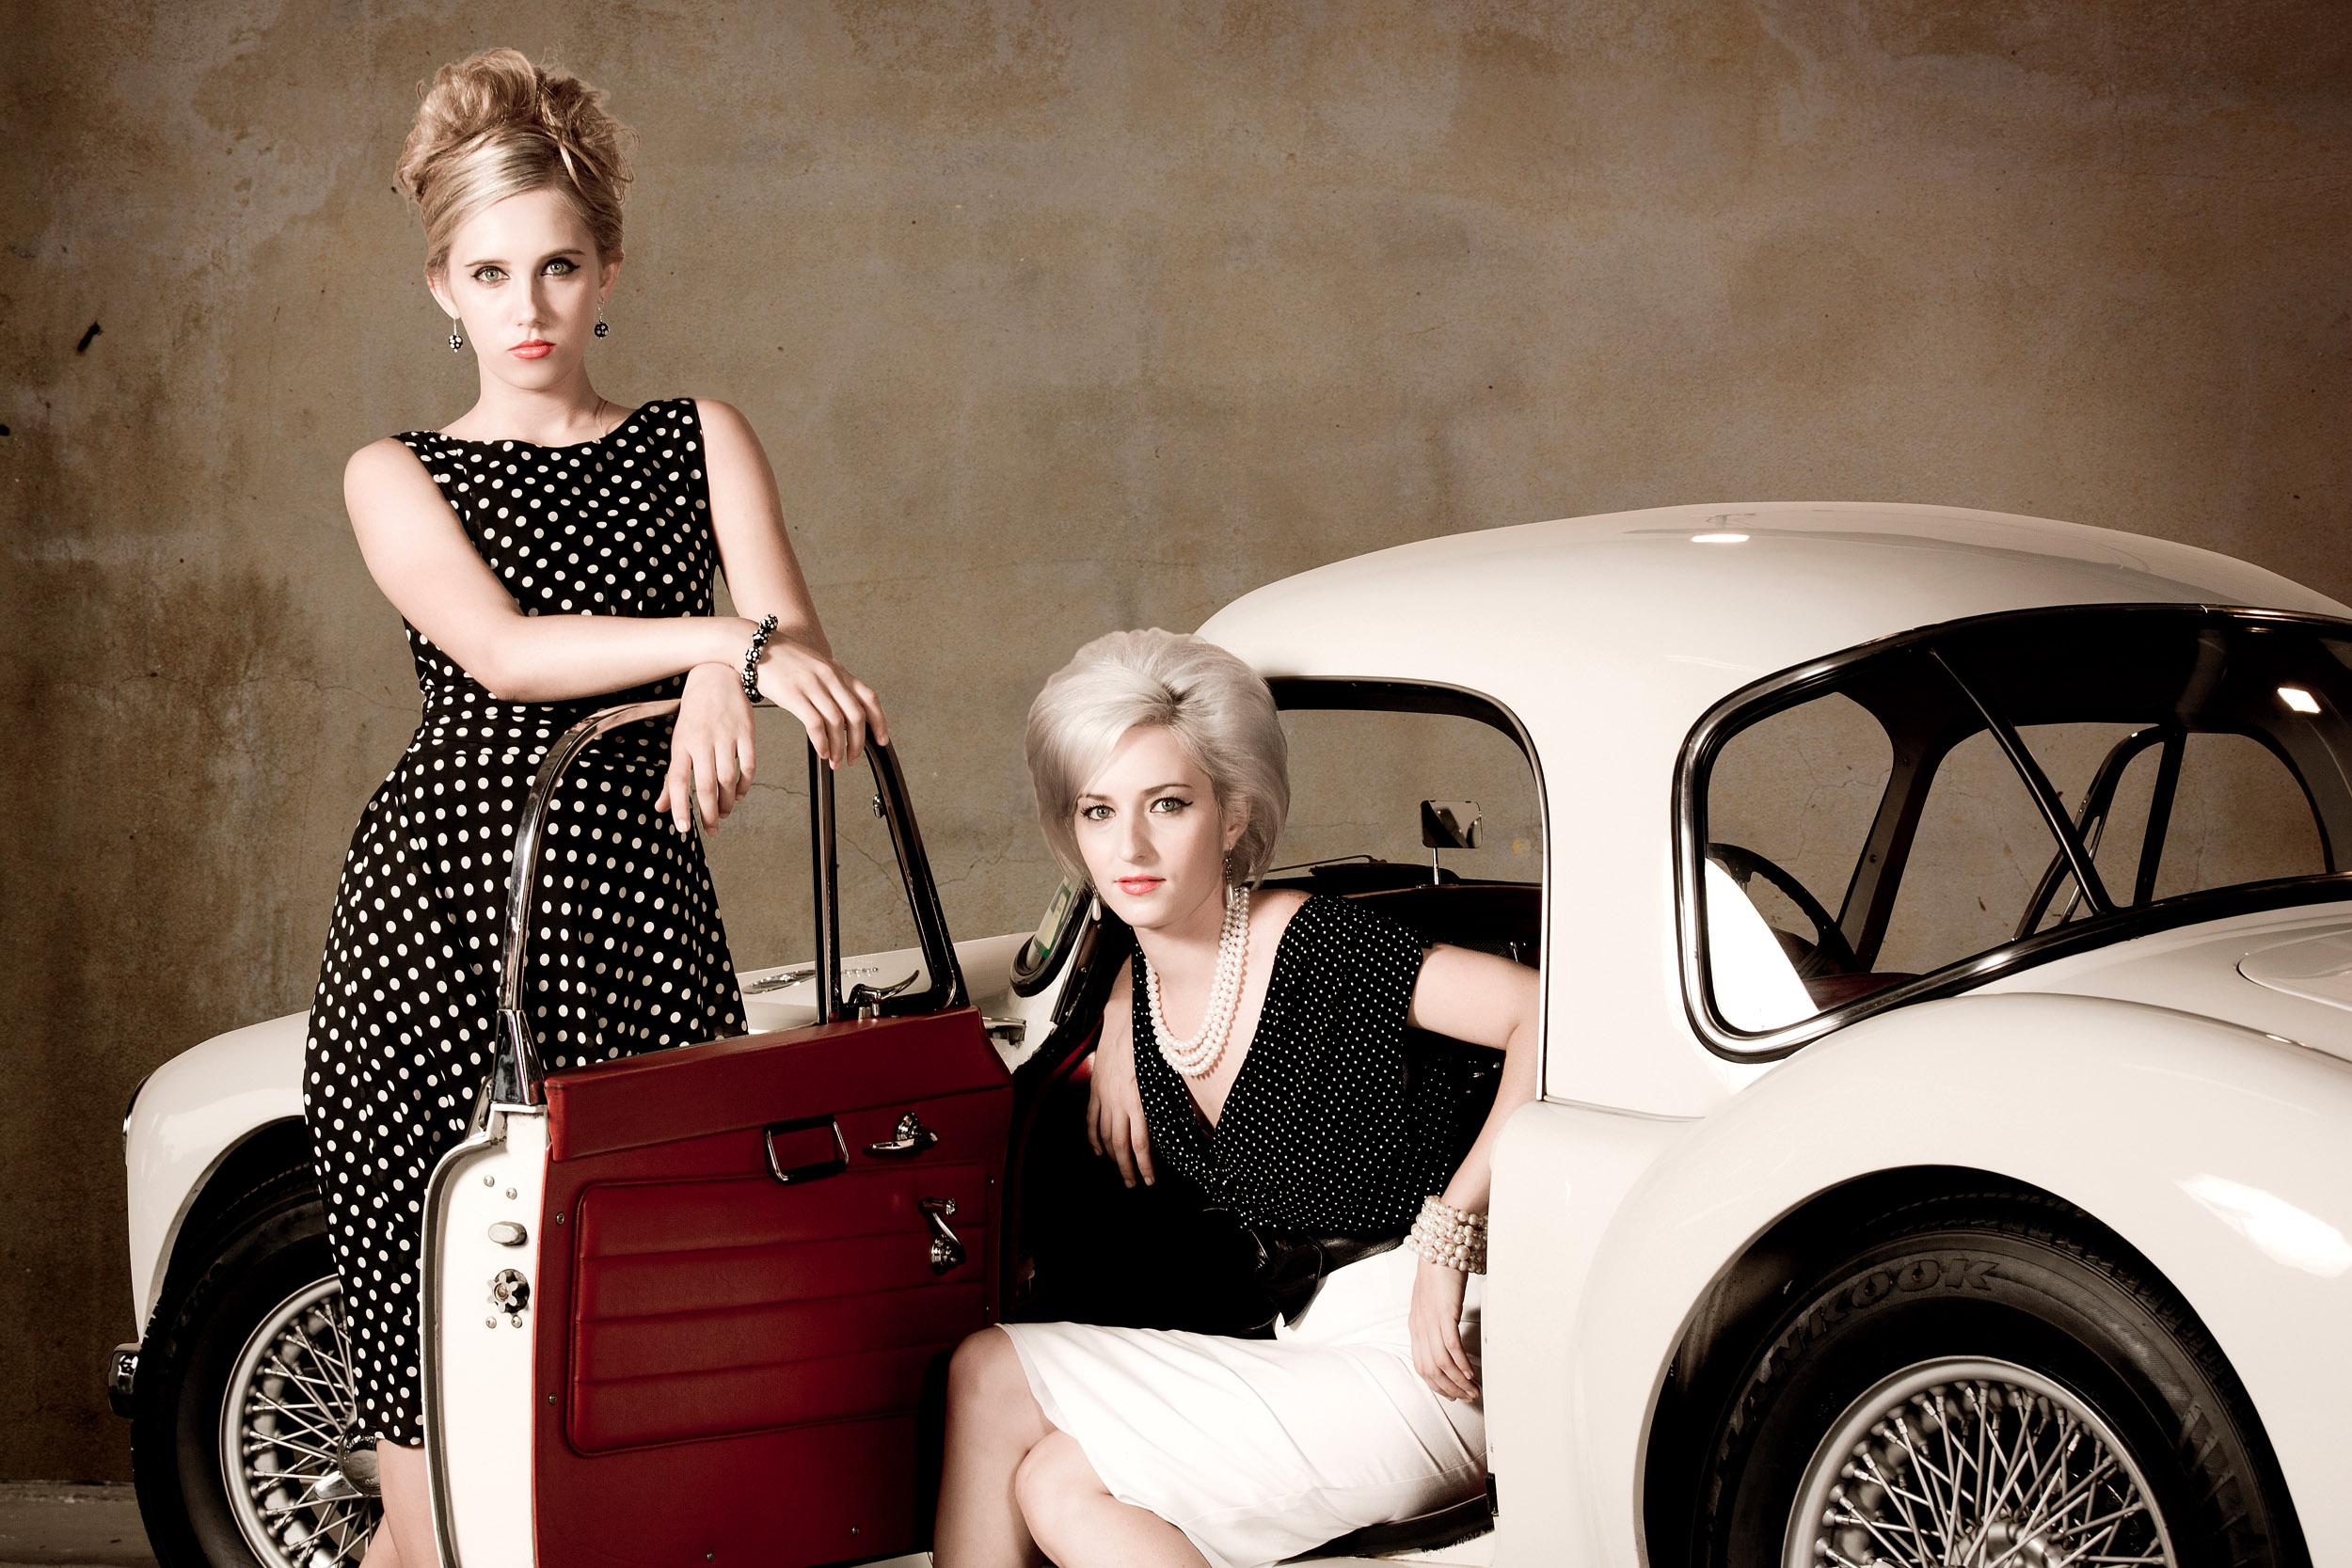 mg-car-fashion-photography-mgb.jpg